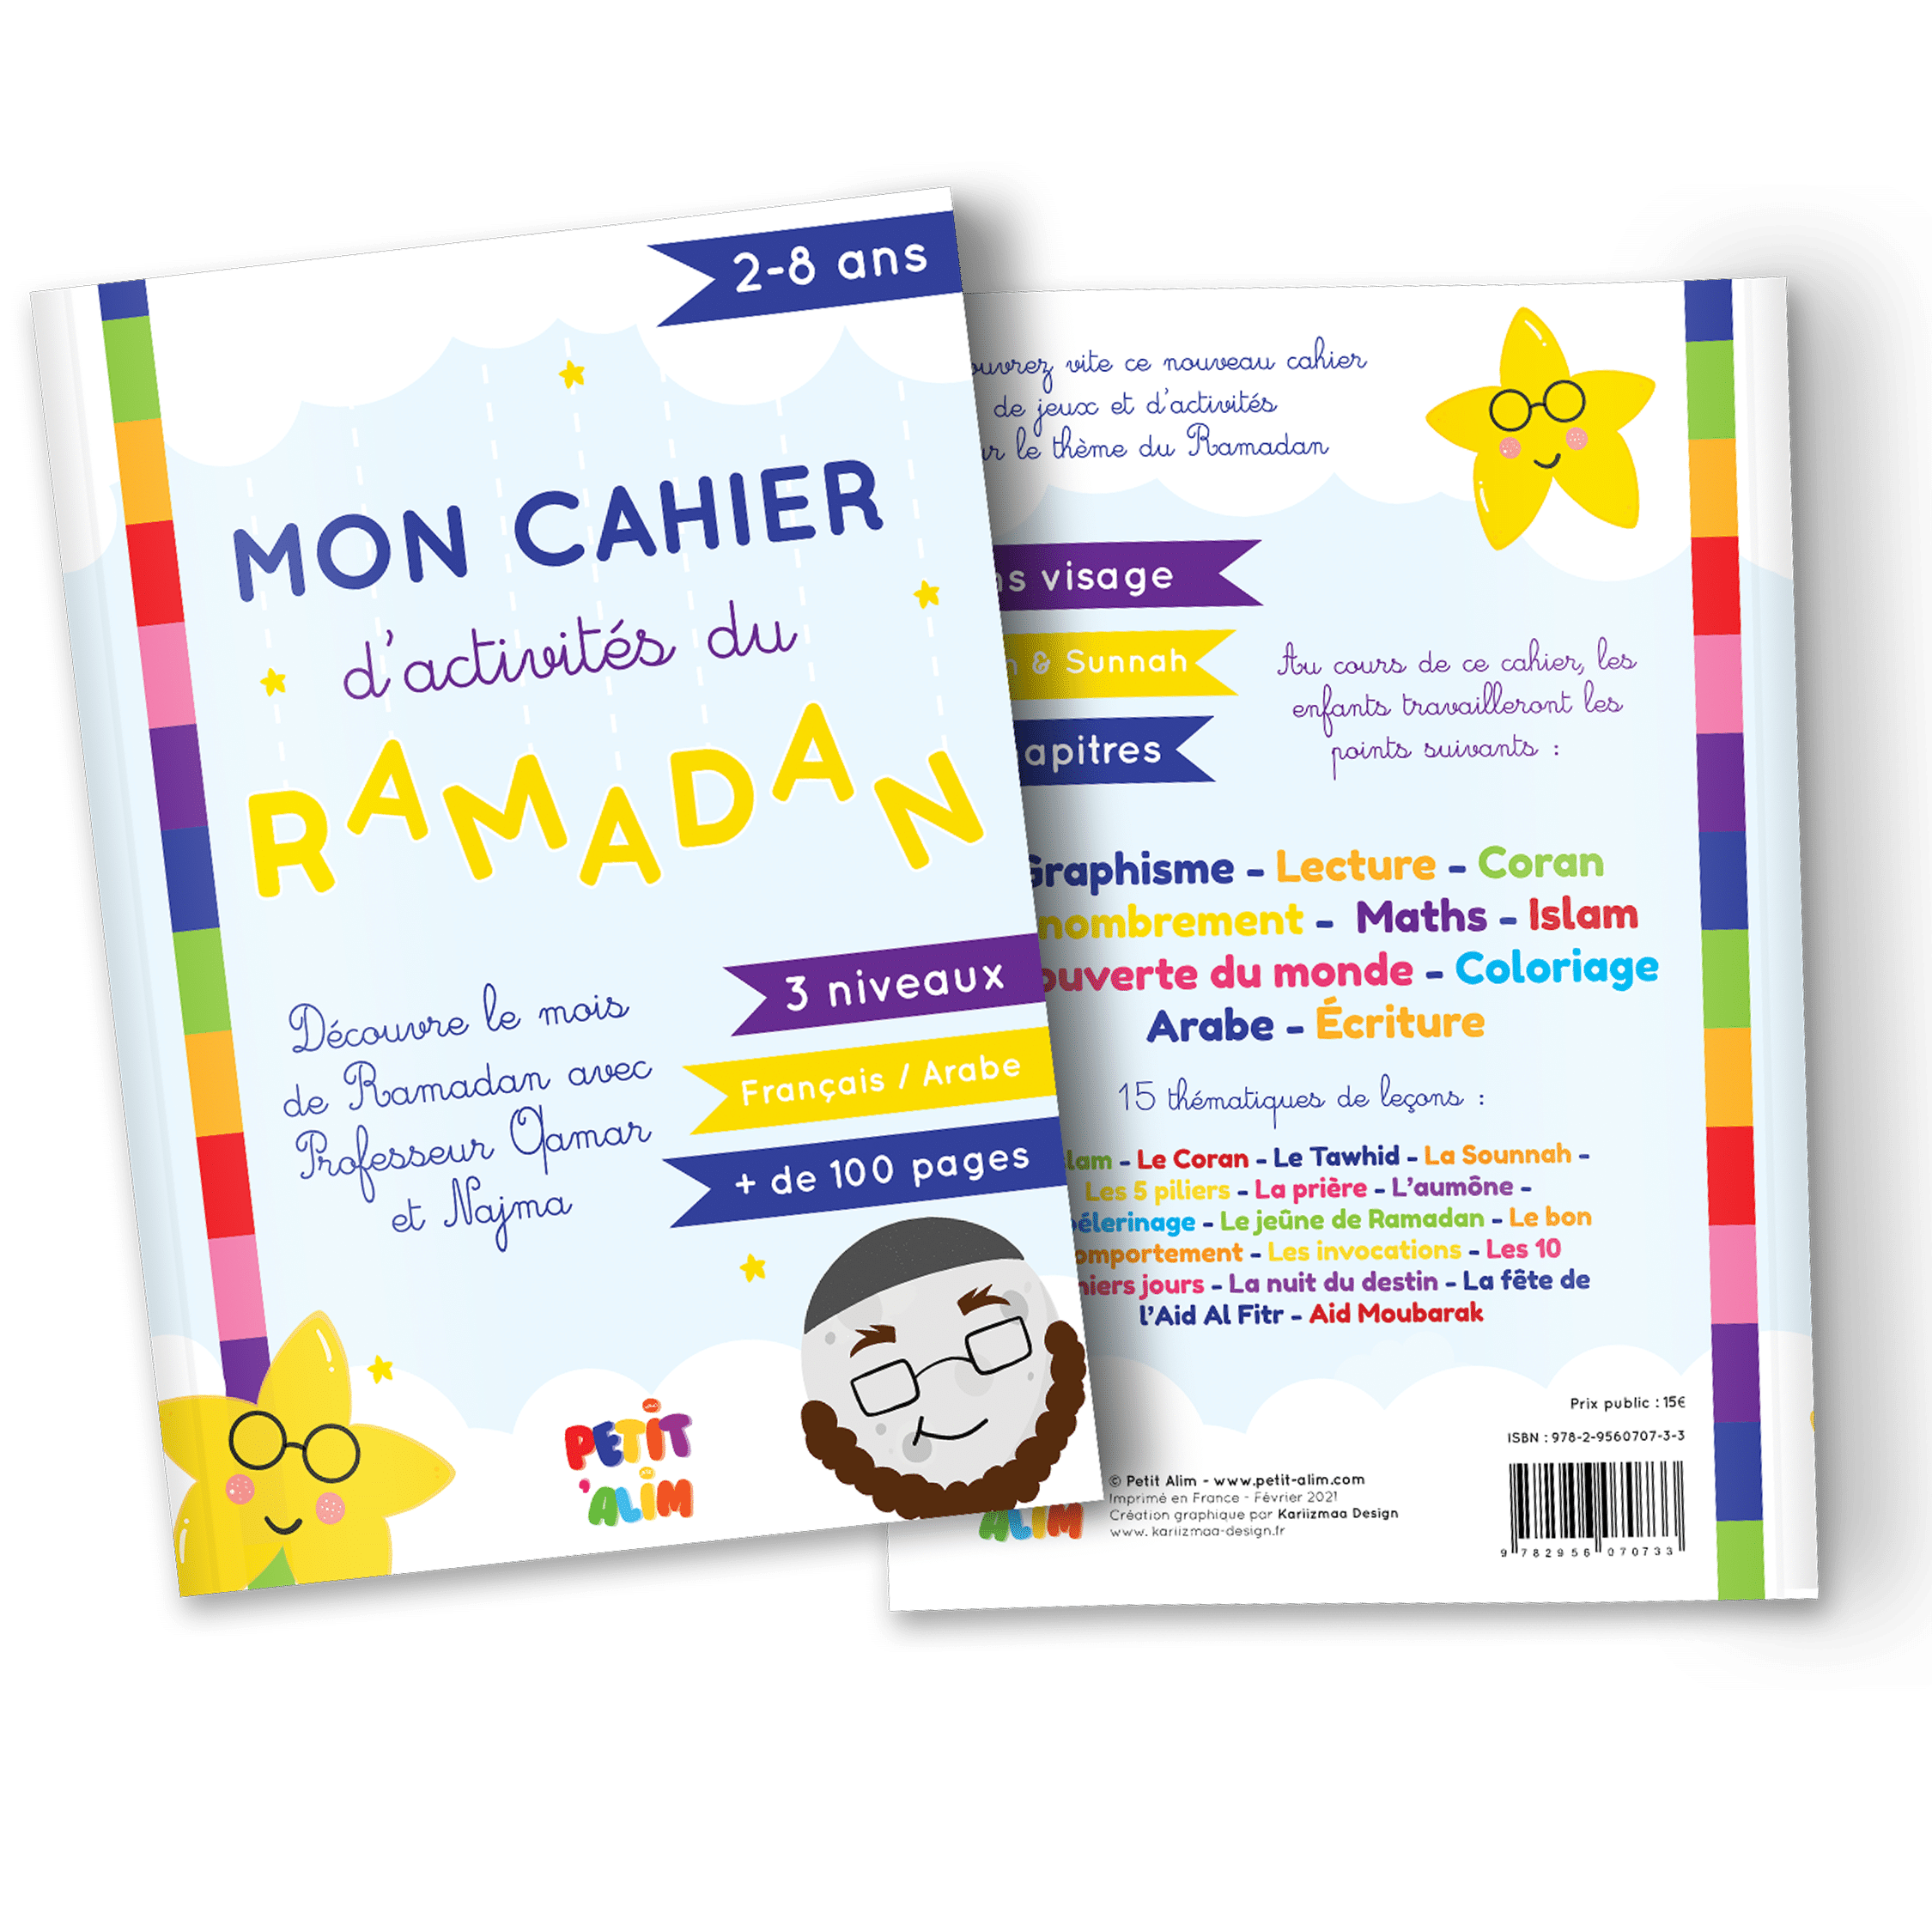 Mon cahier d'activités du Ramadan : 2-8 ans